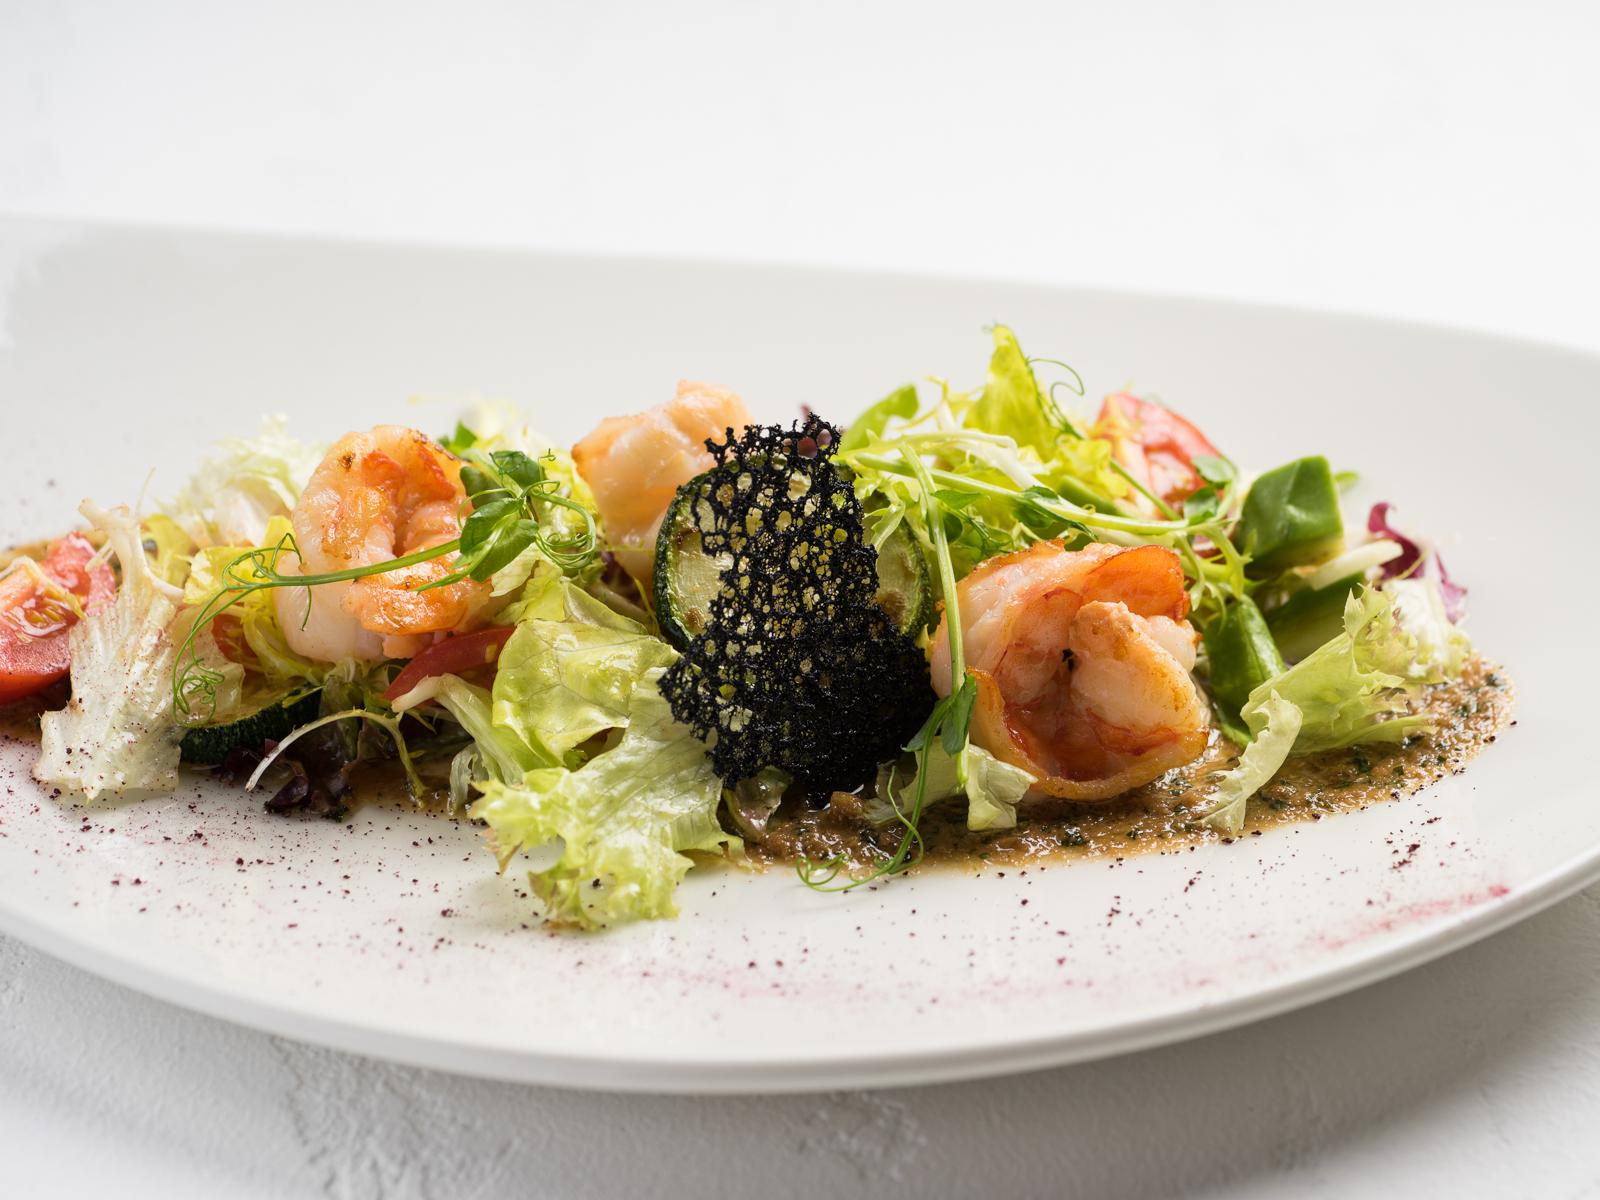 Салат с креветками и цукини-гриль